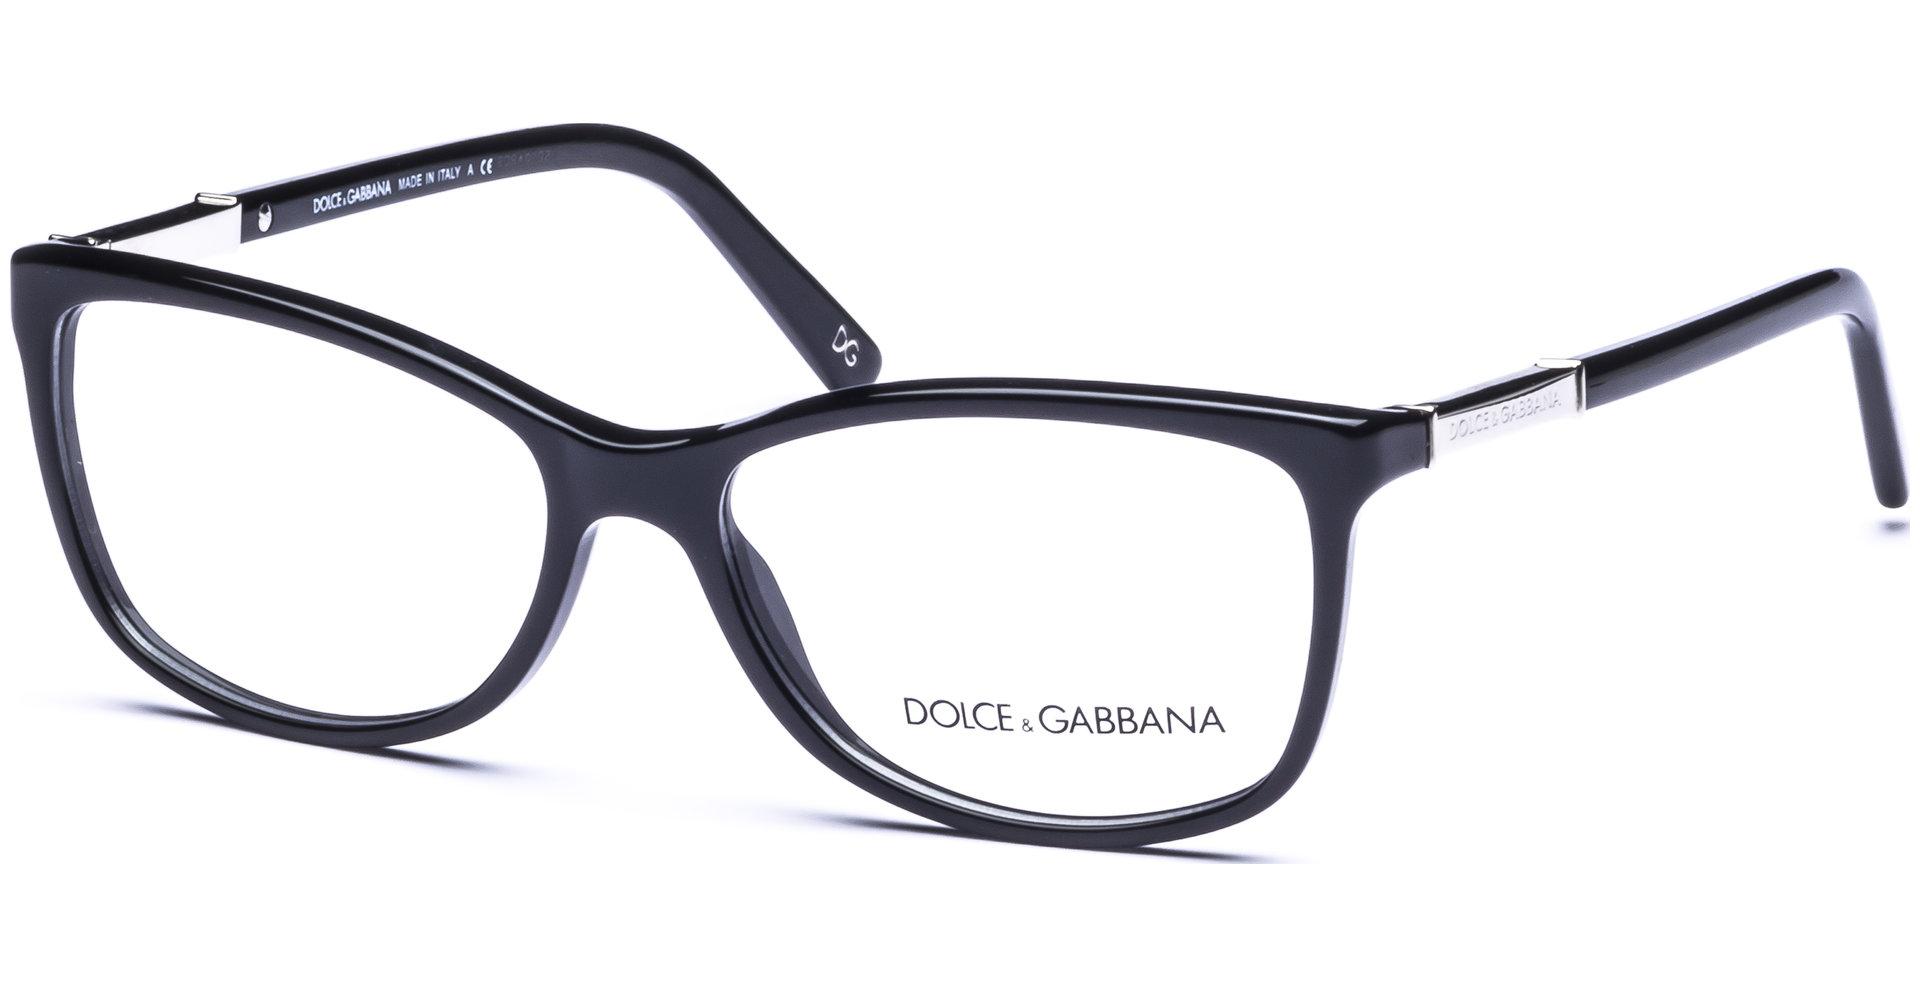 dolce gabbana logo plaque dg3107 501 5415 black von. Black Bedroom Furniture Sets. Home Design Ideas